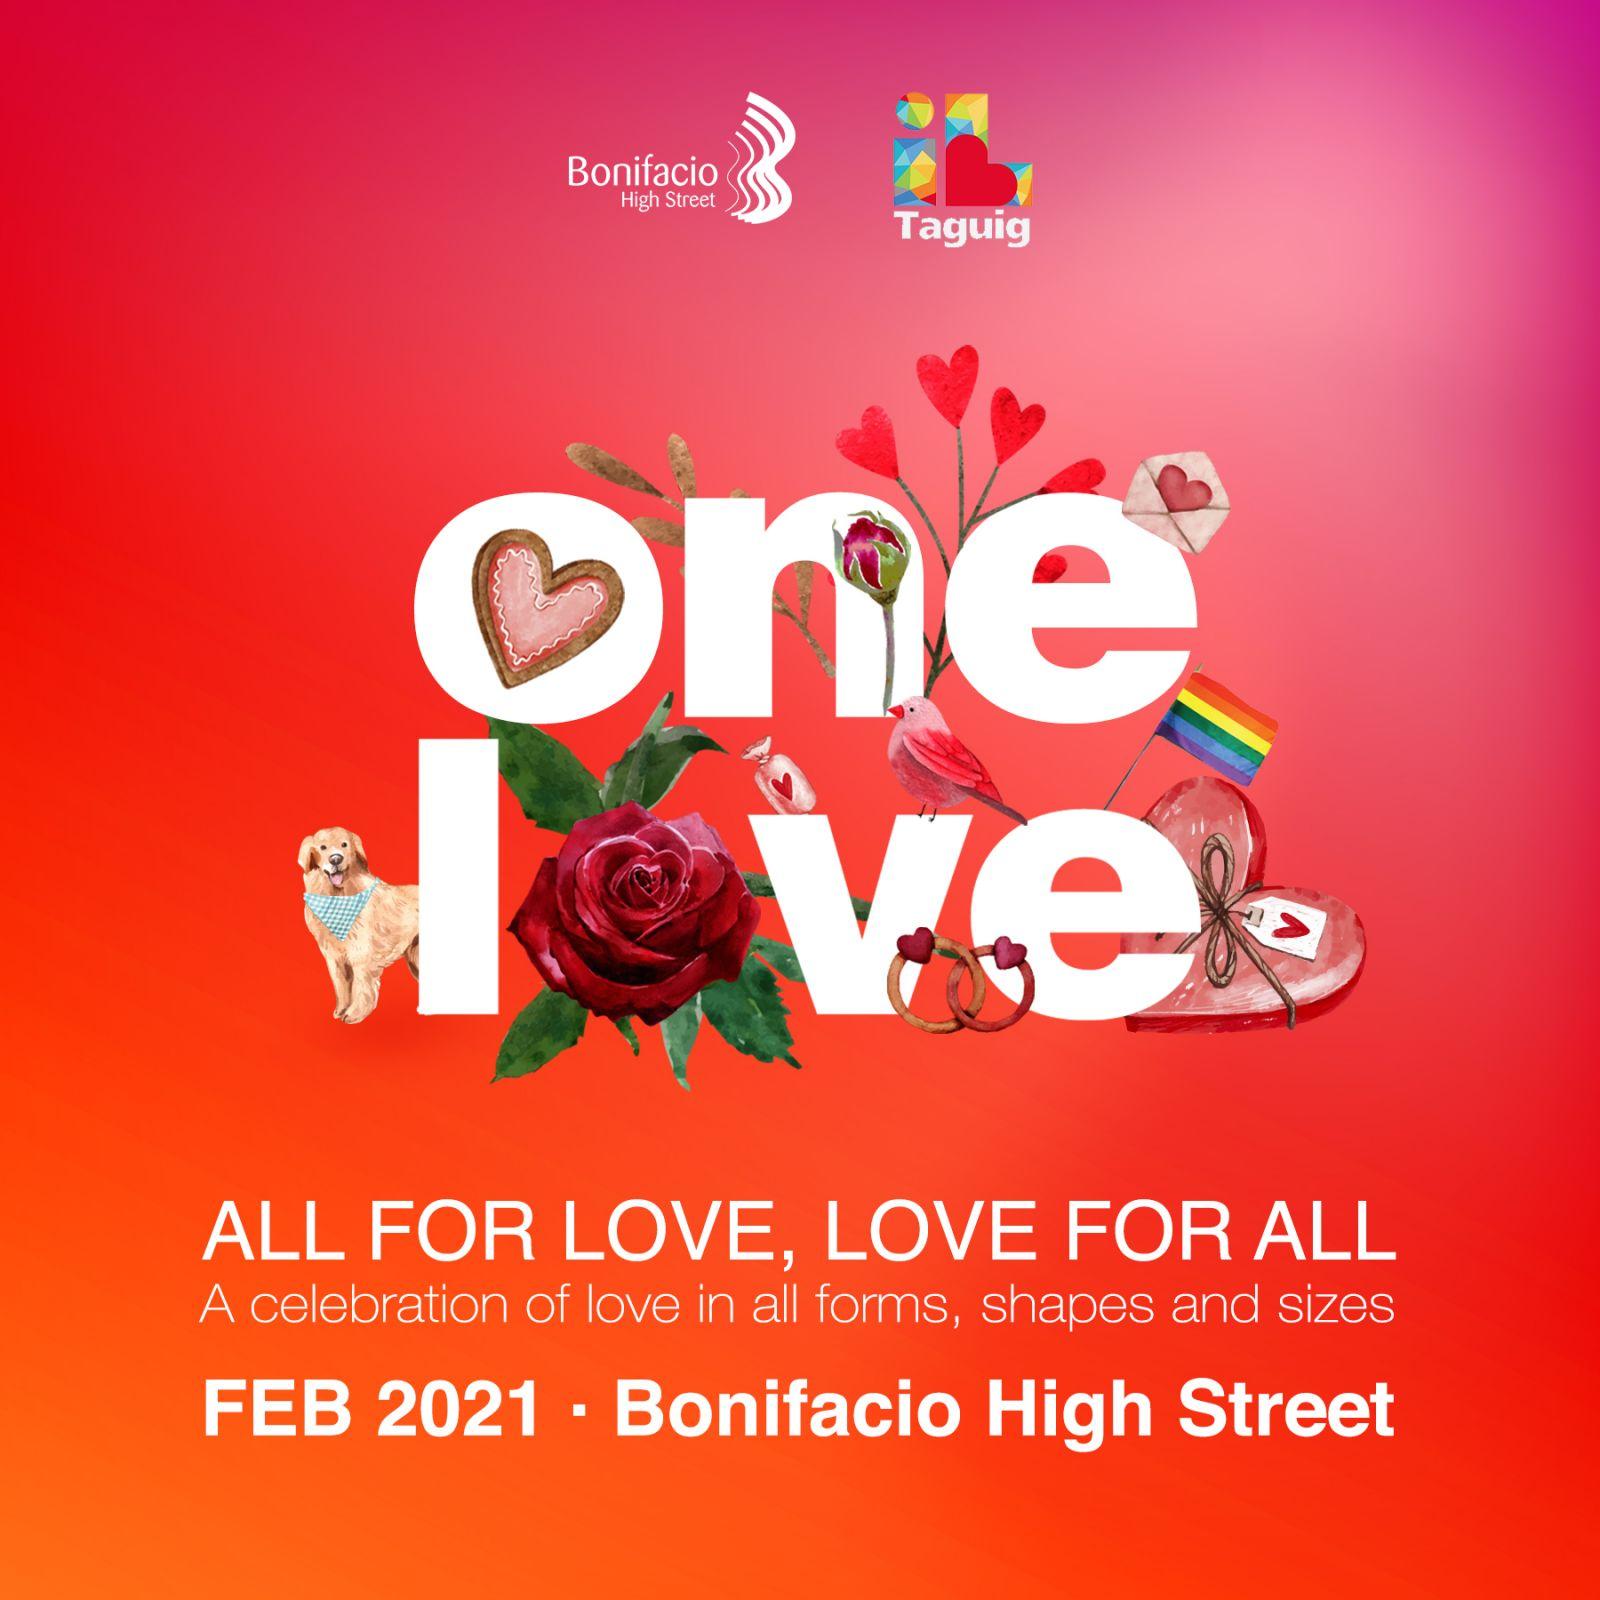 Valentine's Day celebrations in Bonifacio High Street